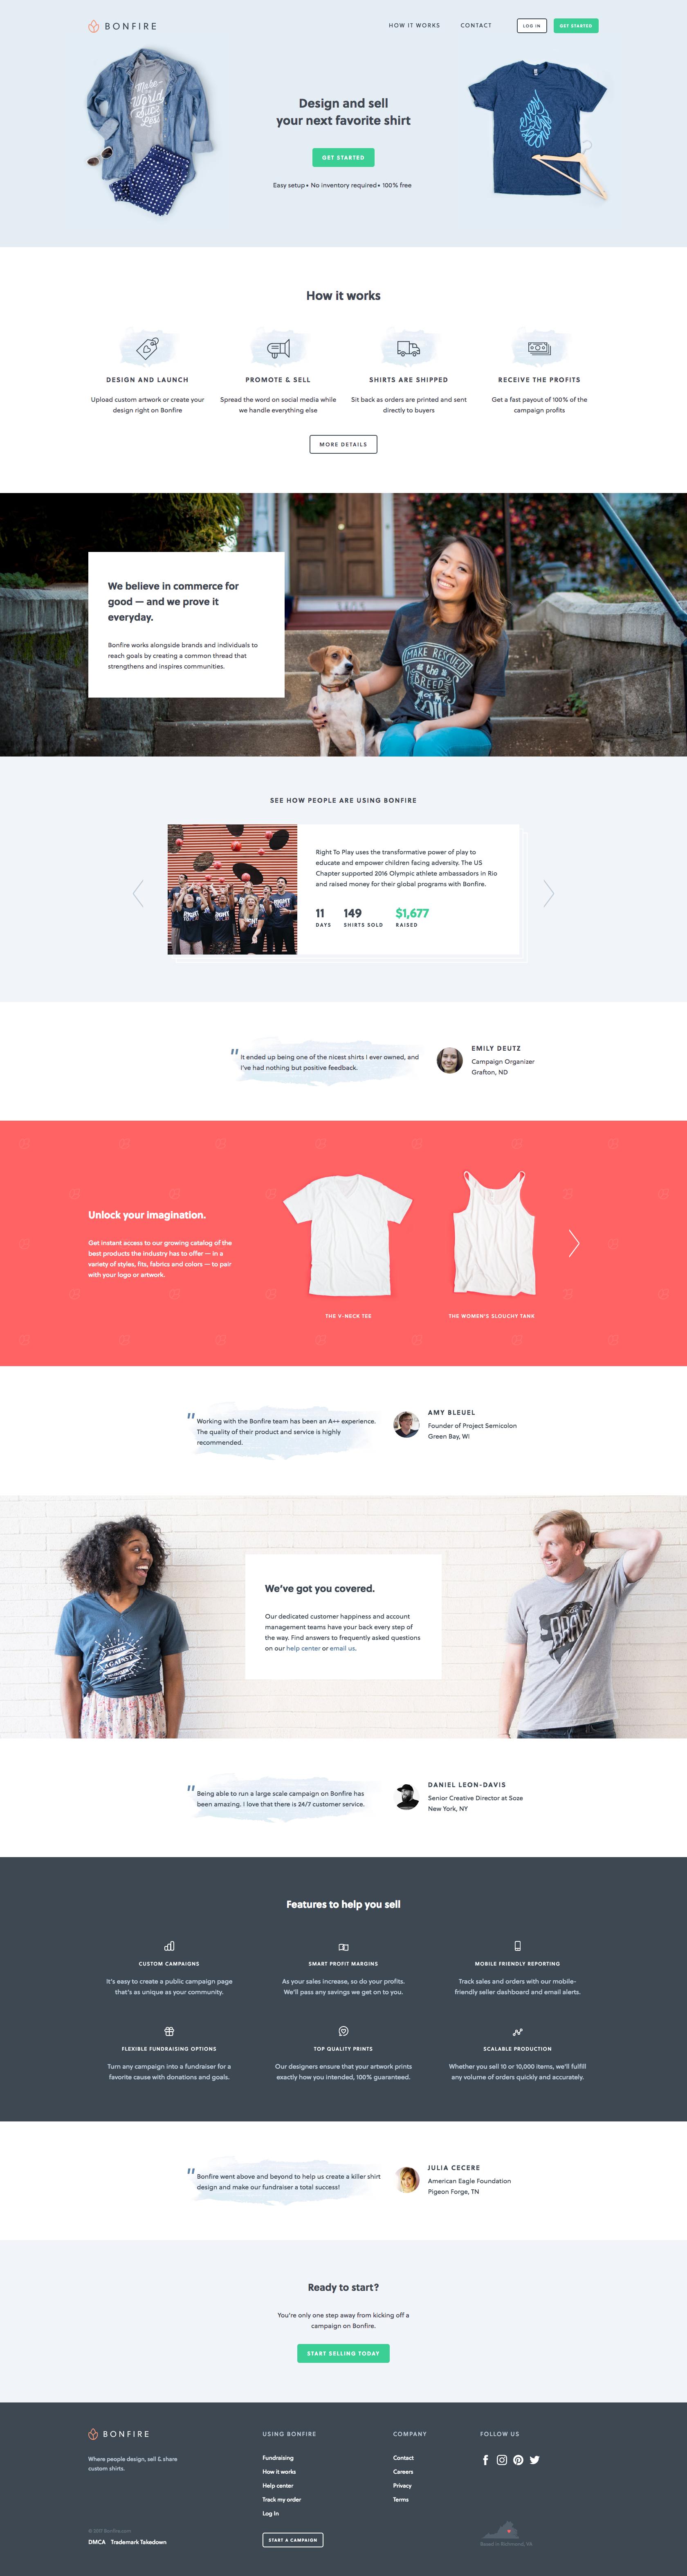 Pin by Naweed Shams on Inspiring Web Design Ideas 2018   Pinterest ...